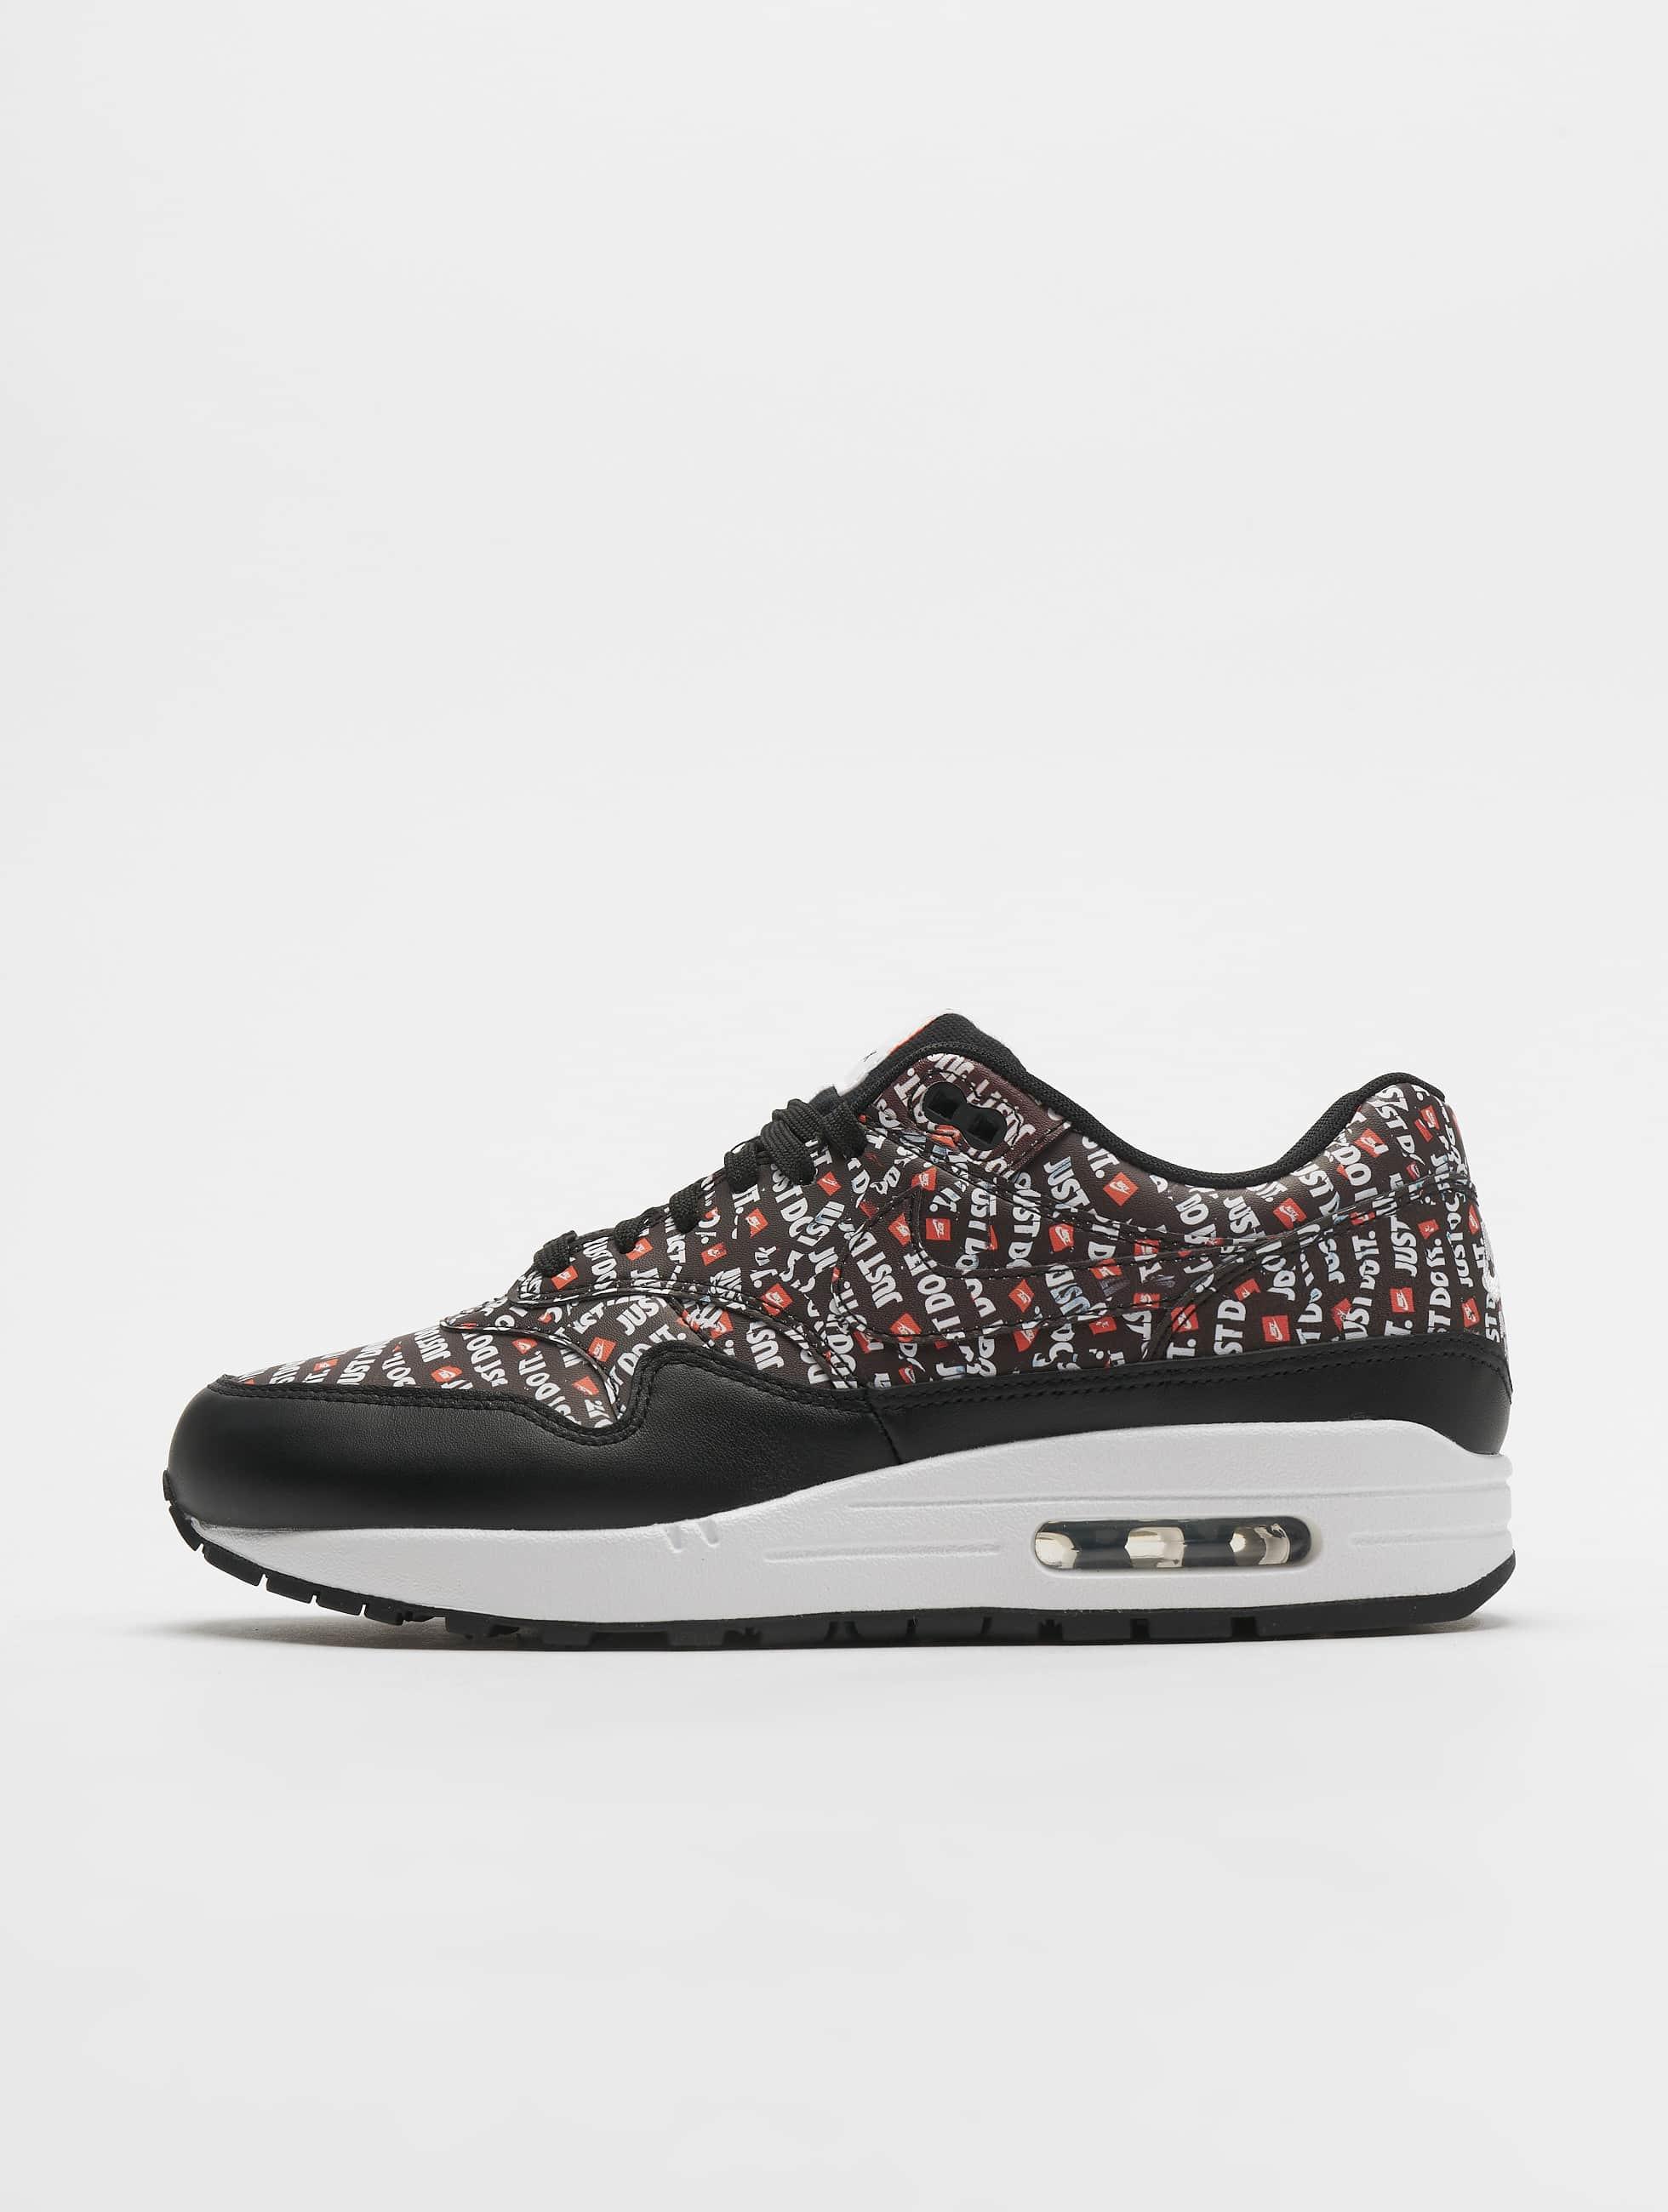 huge discount 1347b 206f8 Nike schoen   sneaker Mike Air Max 1 Premium in zwart 498863